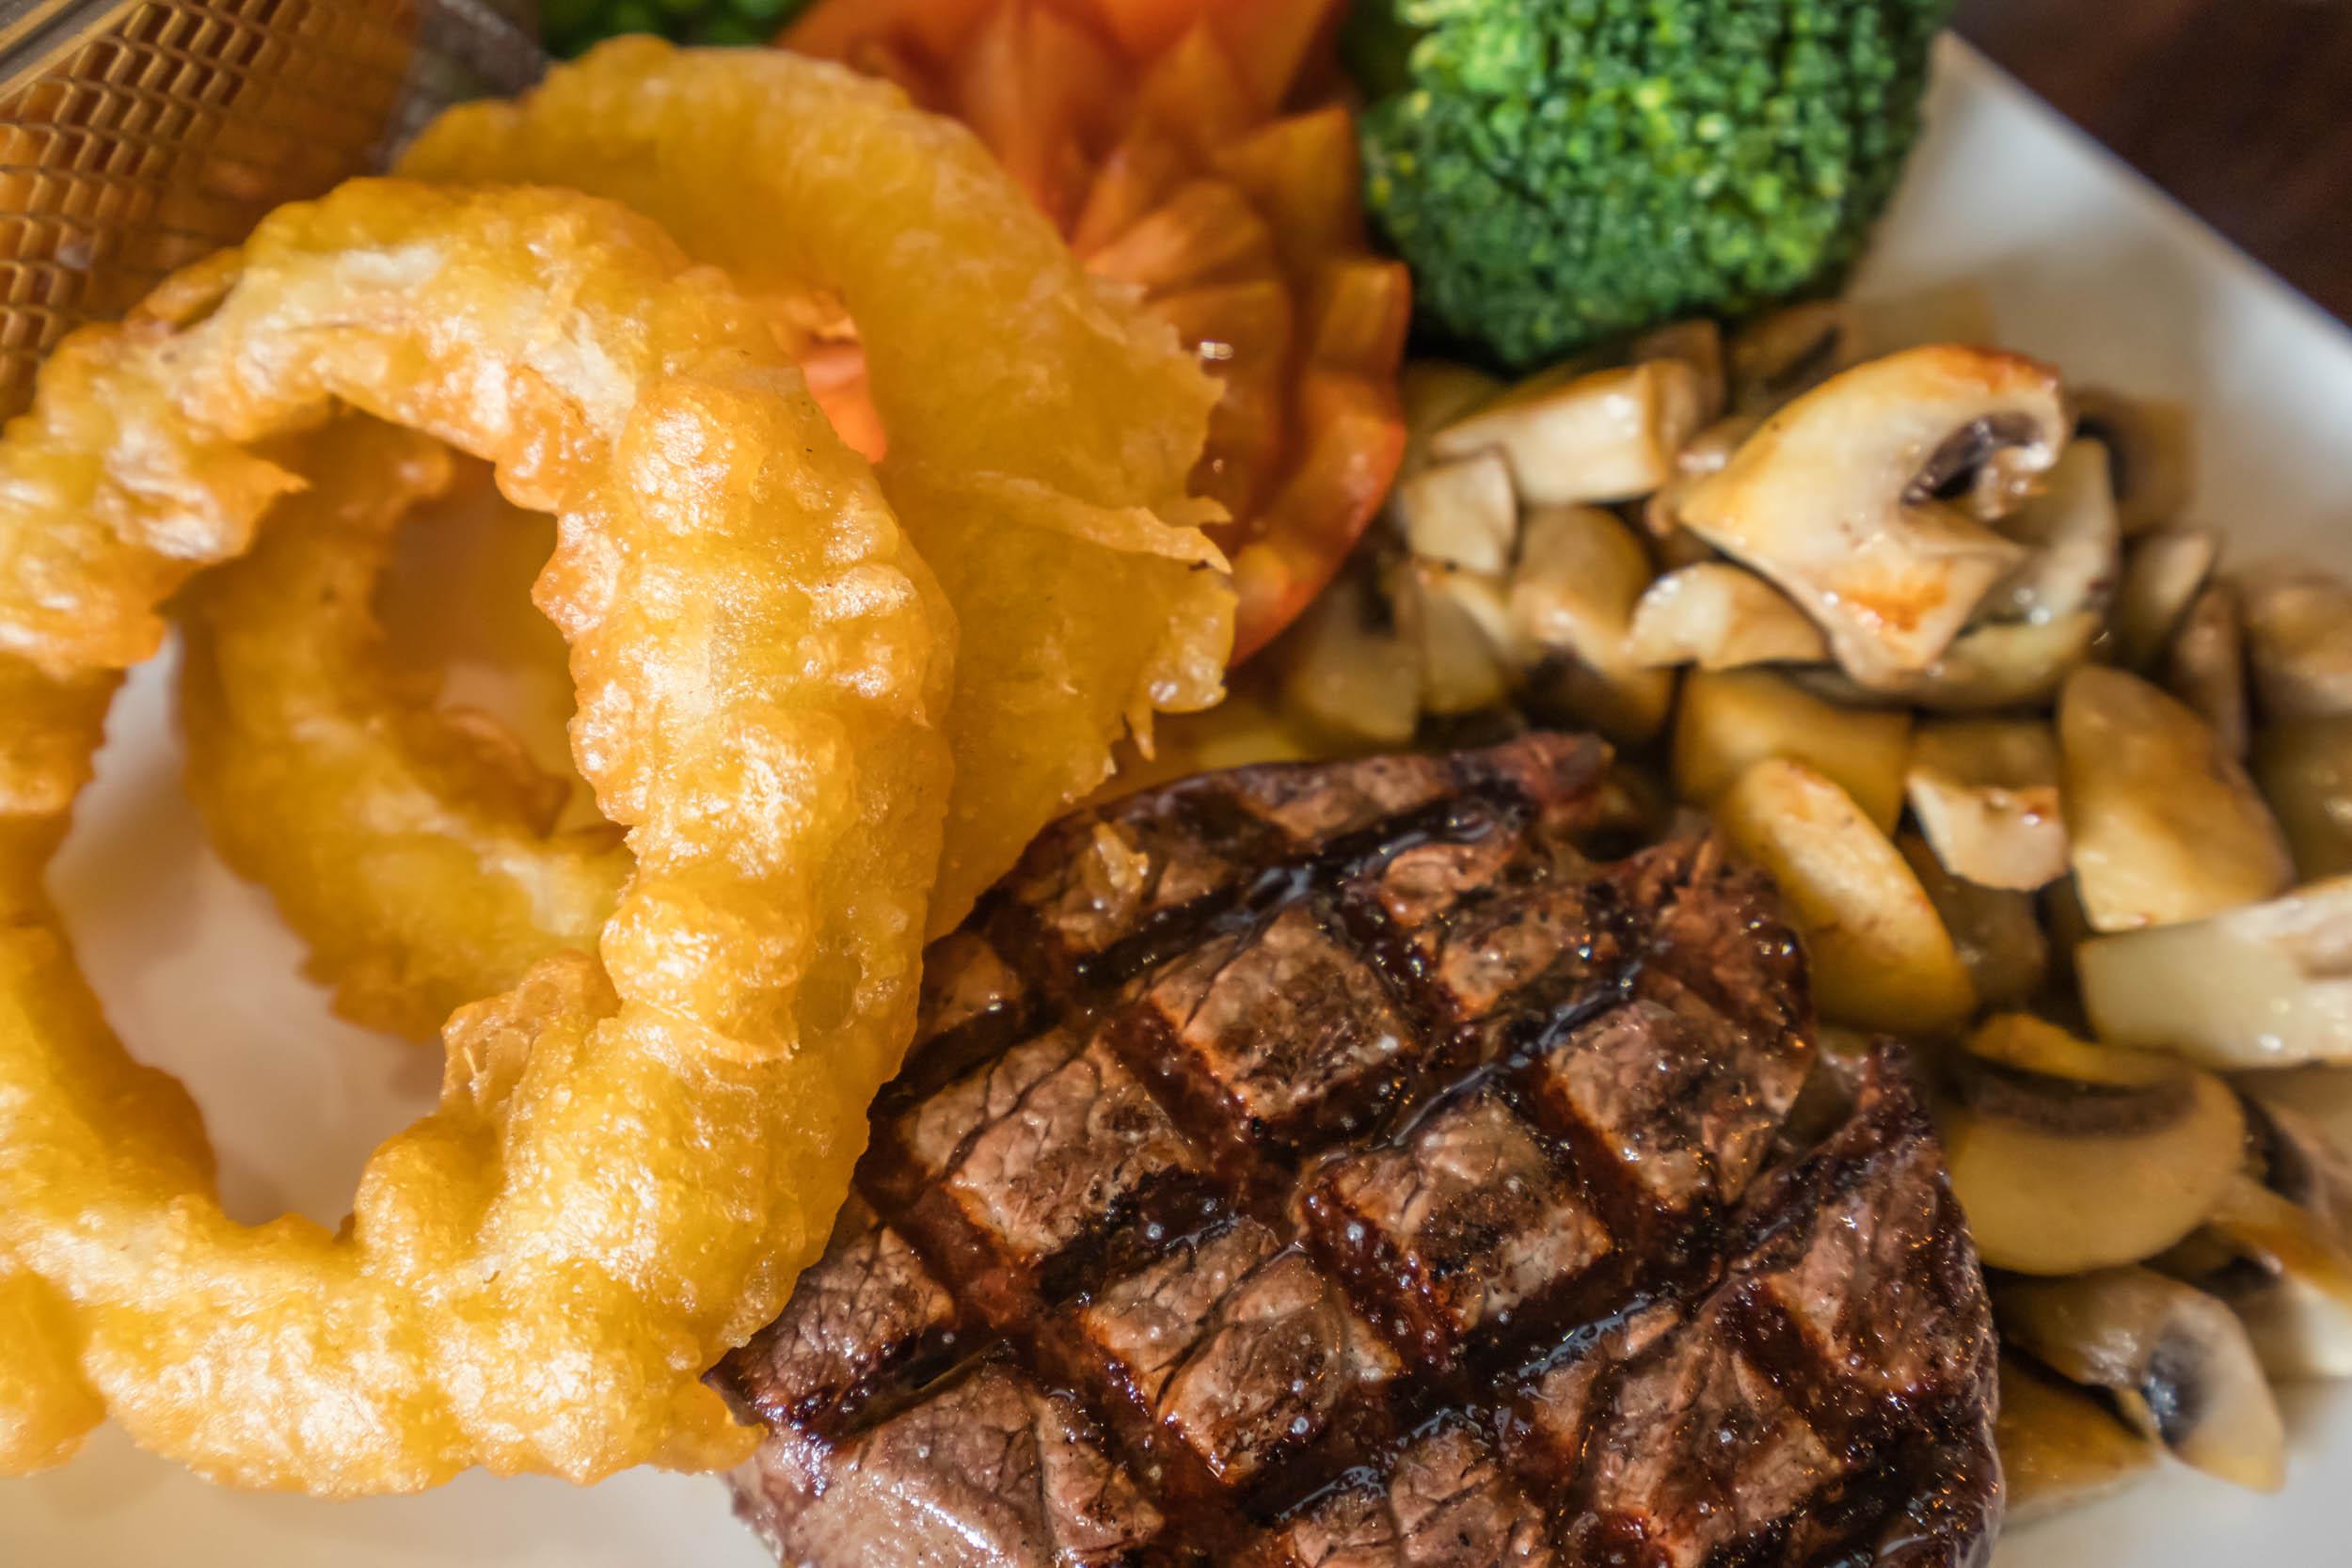 Clachan-Inn-Drymen-Food-02106.jpg